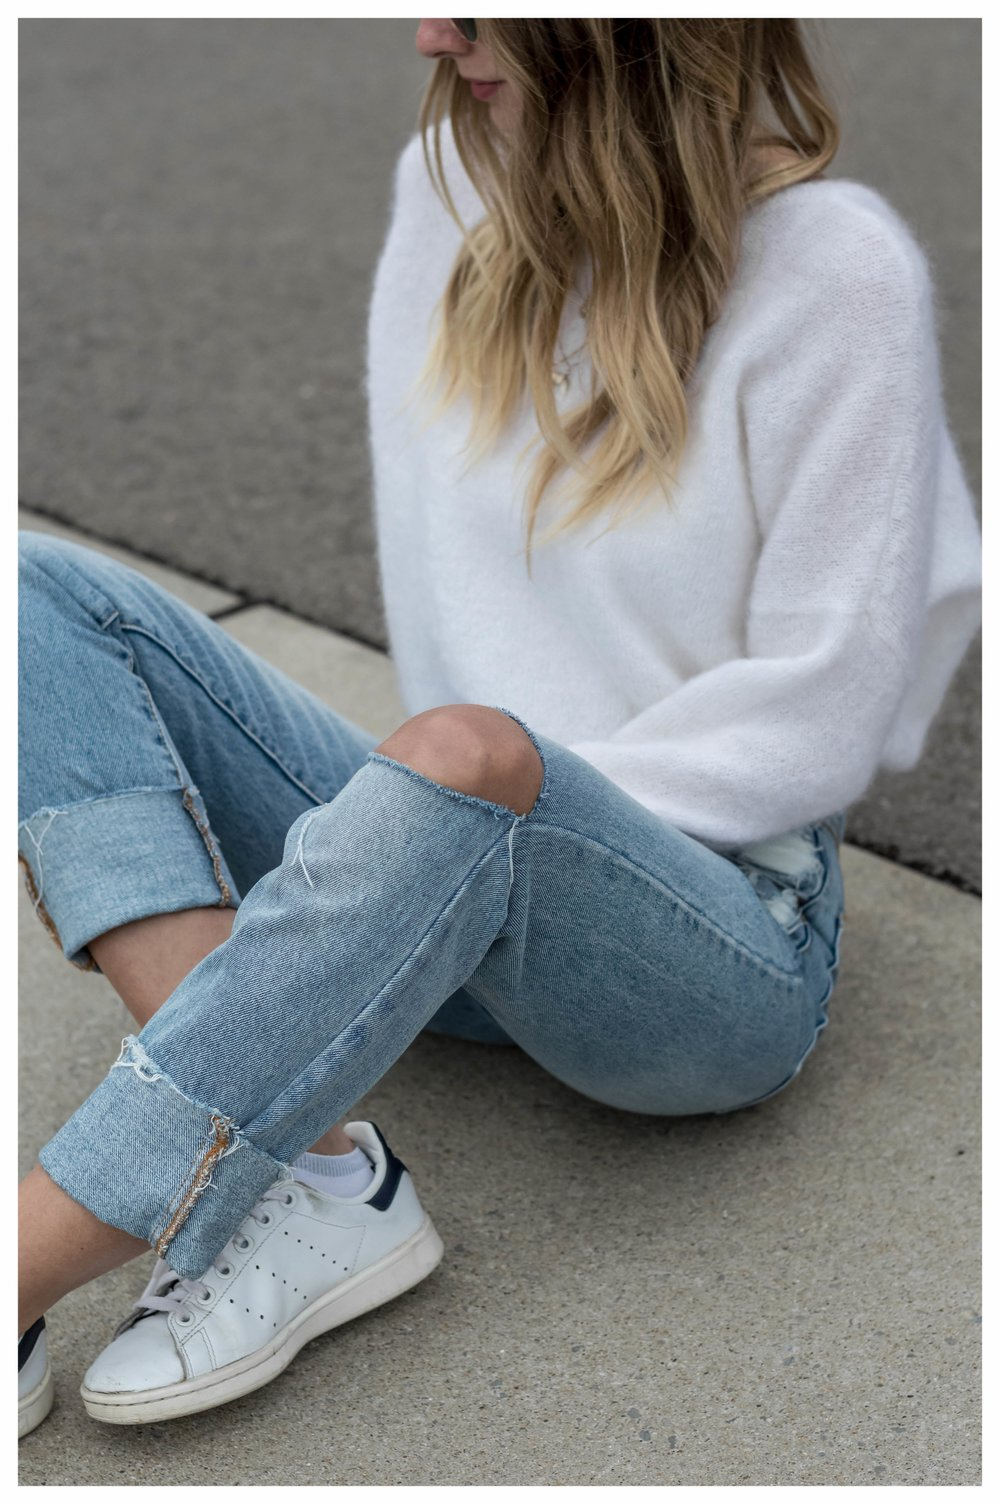 High Jeans - OSIARAH.COM (11 sur 21).jpg